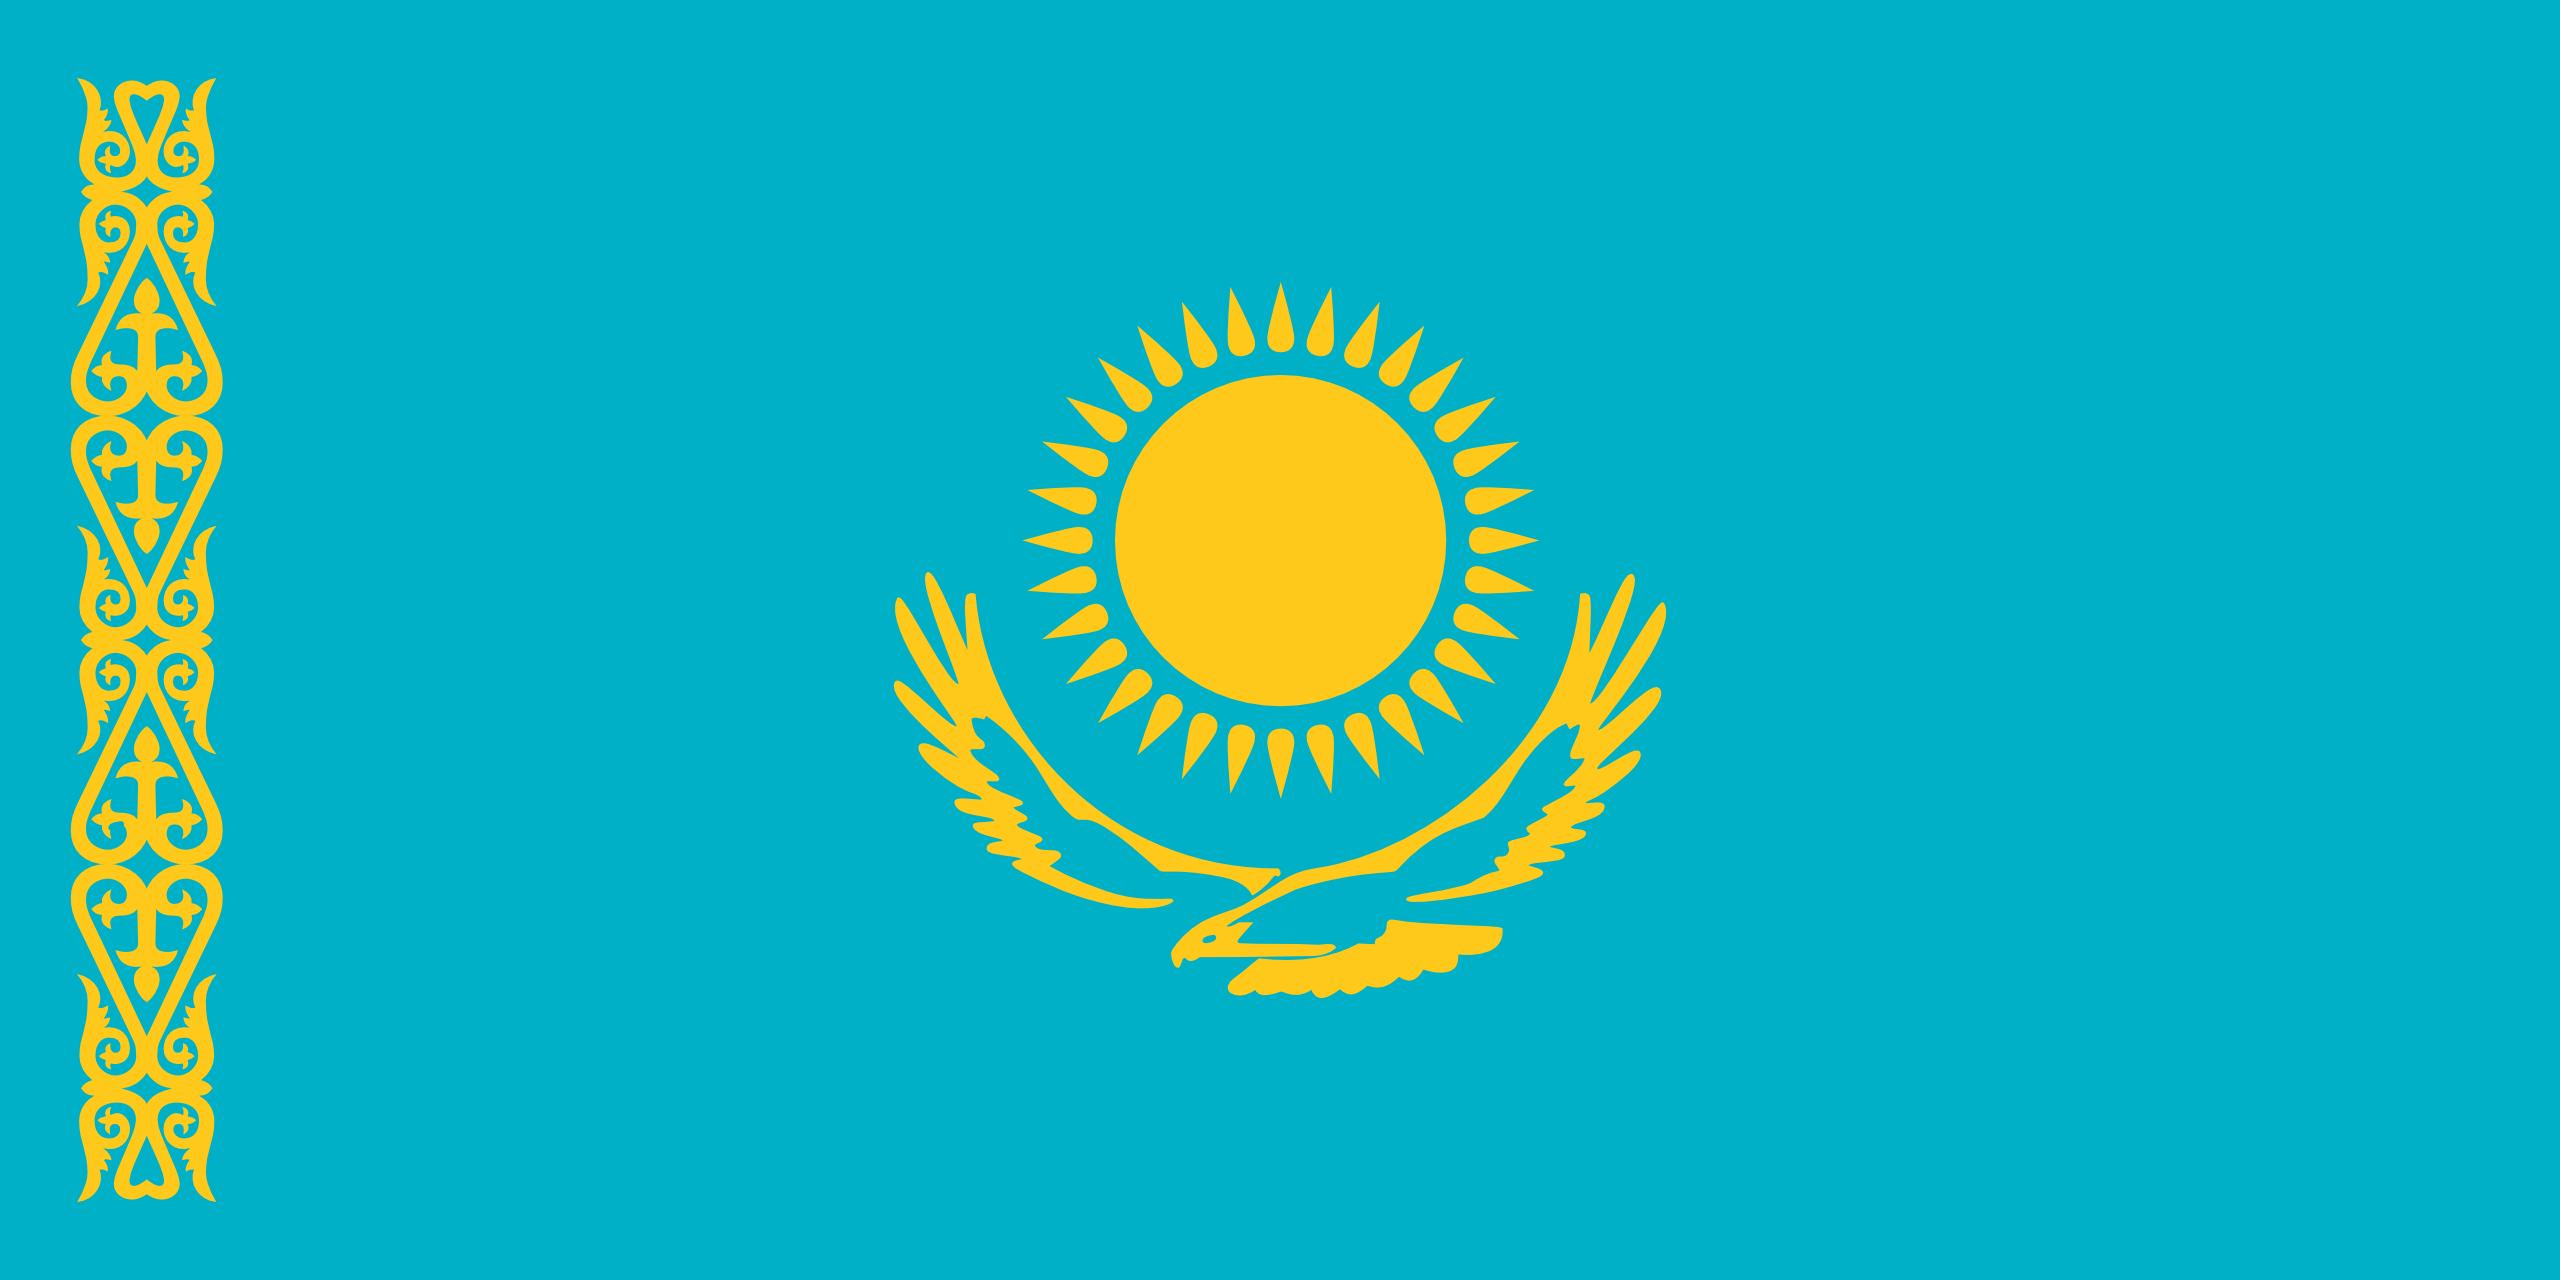 kazajistán, Land, Emblem, Logo, Symbol - Wallpaper HD - Prof.-falken.com